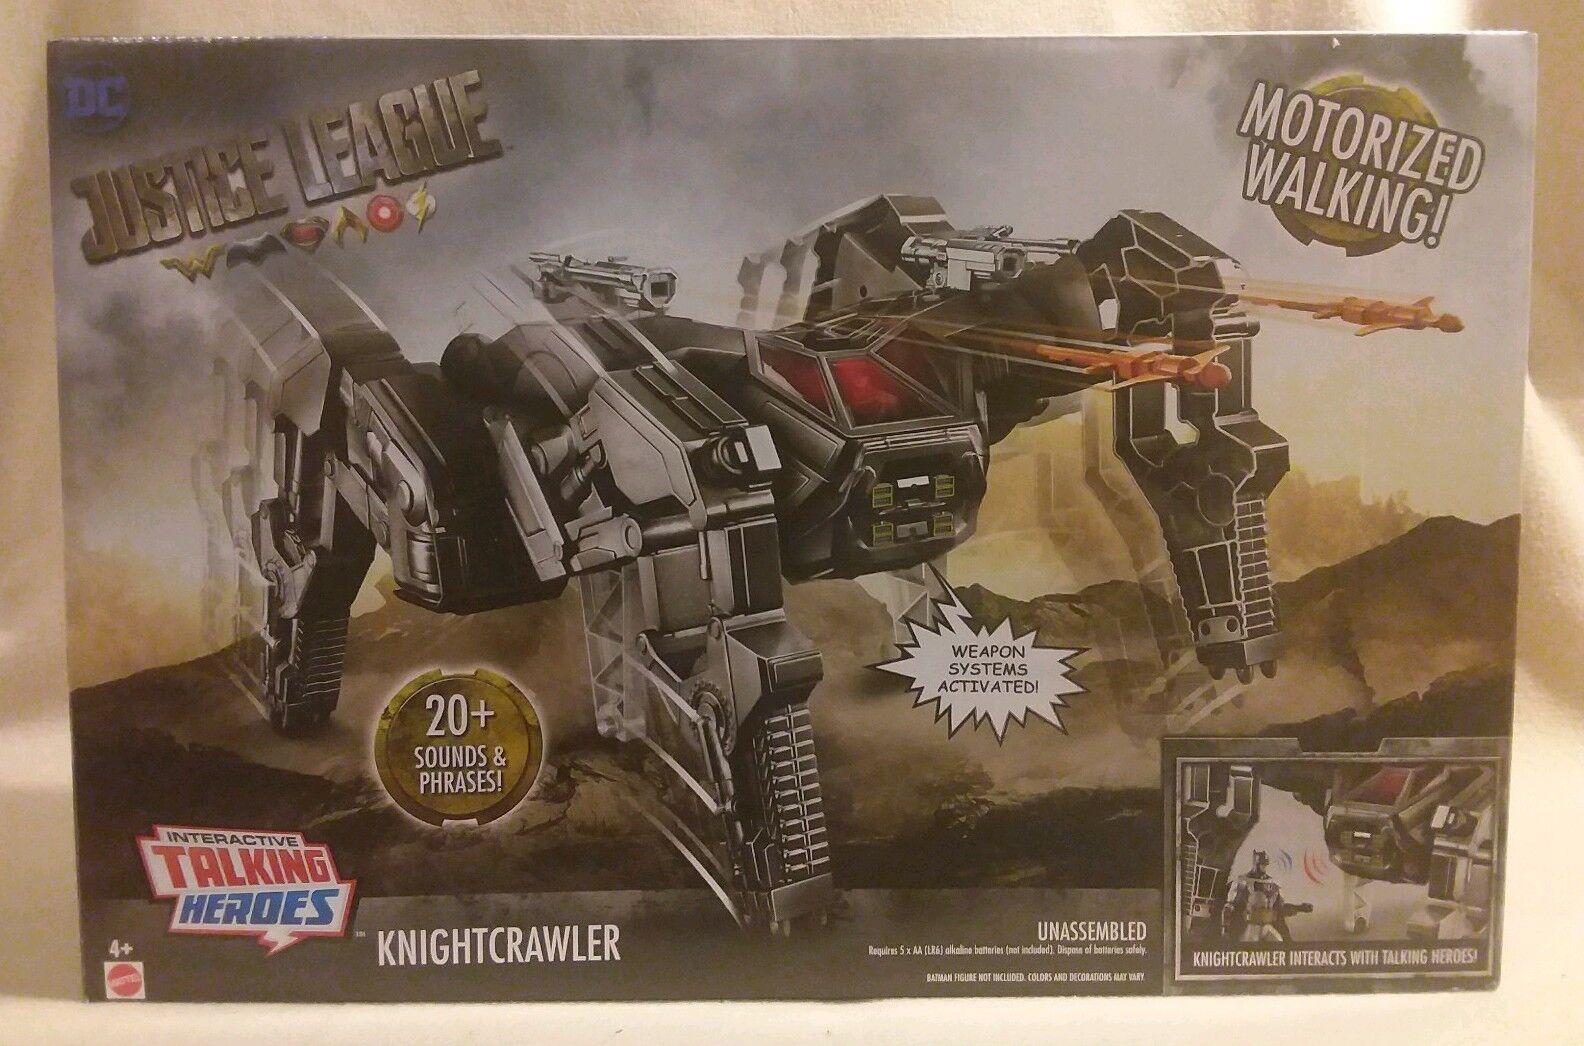 DC Justice  League  Knight Crawler  Motorized Walker Mattel Toys 2017  sortie de marque